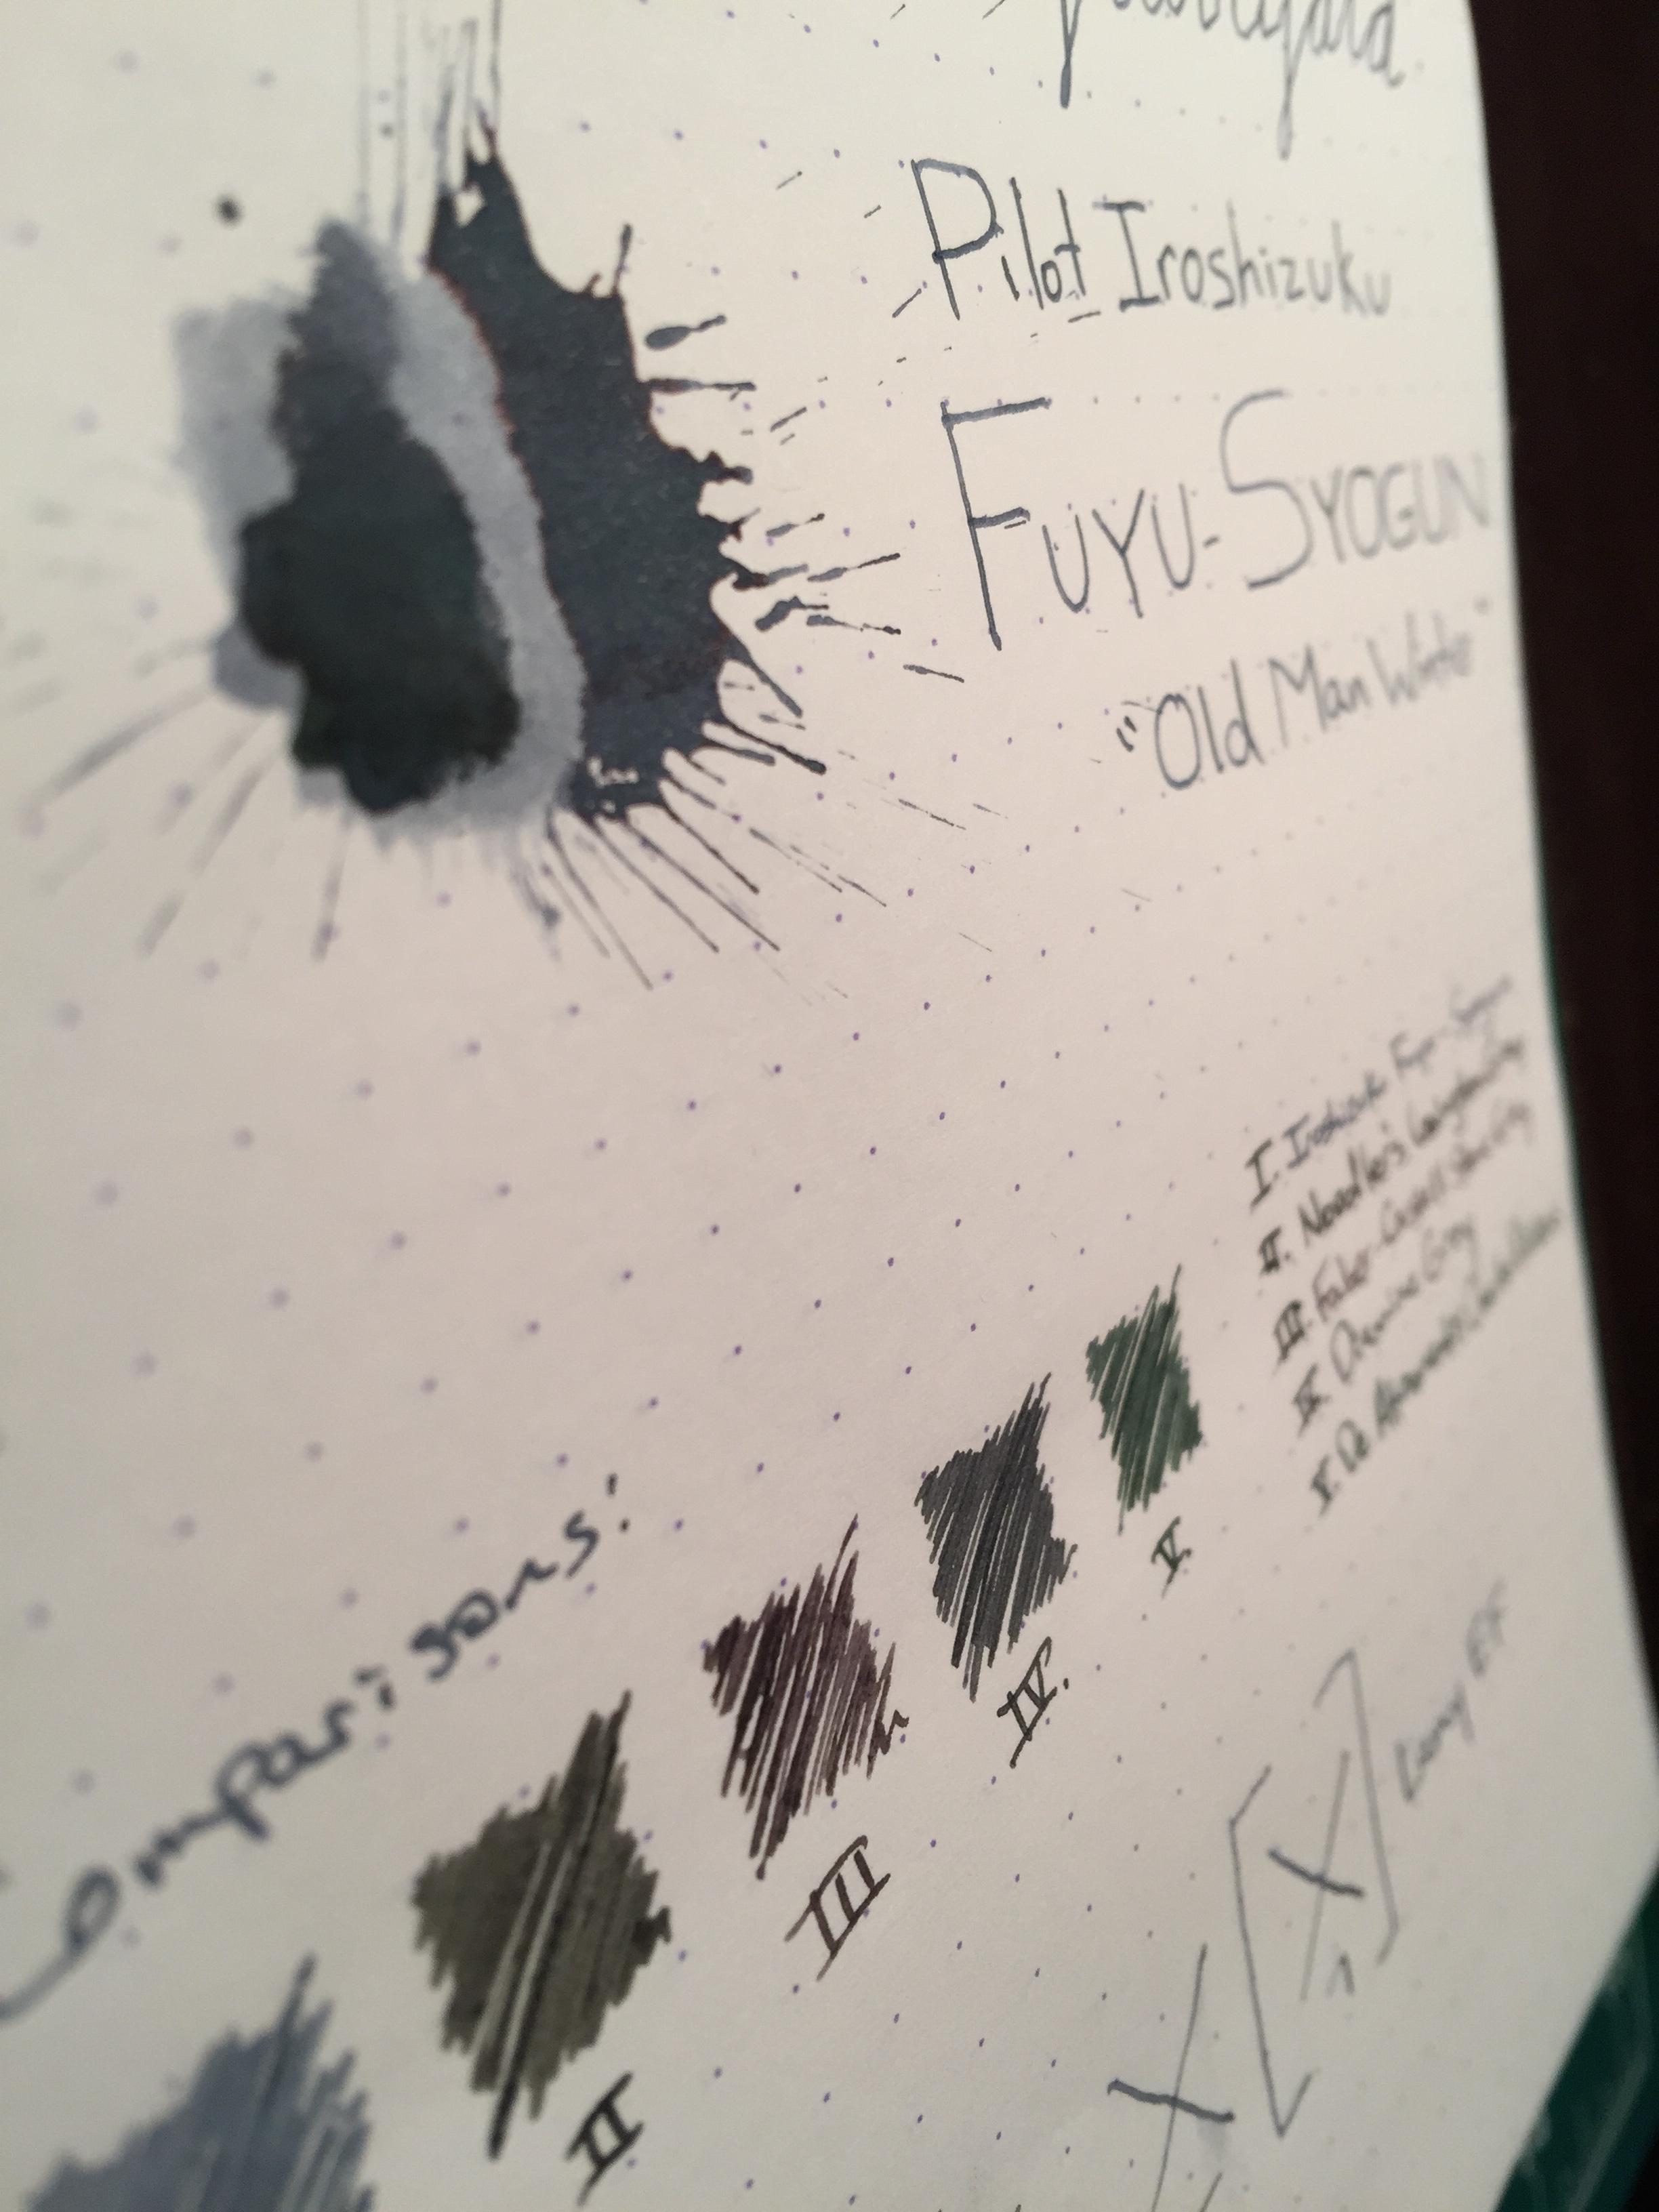 fuyusyogun-header